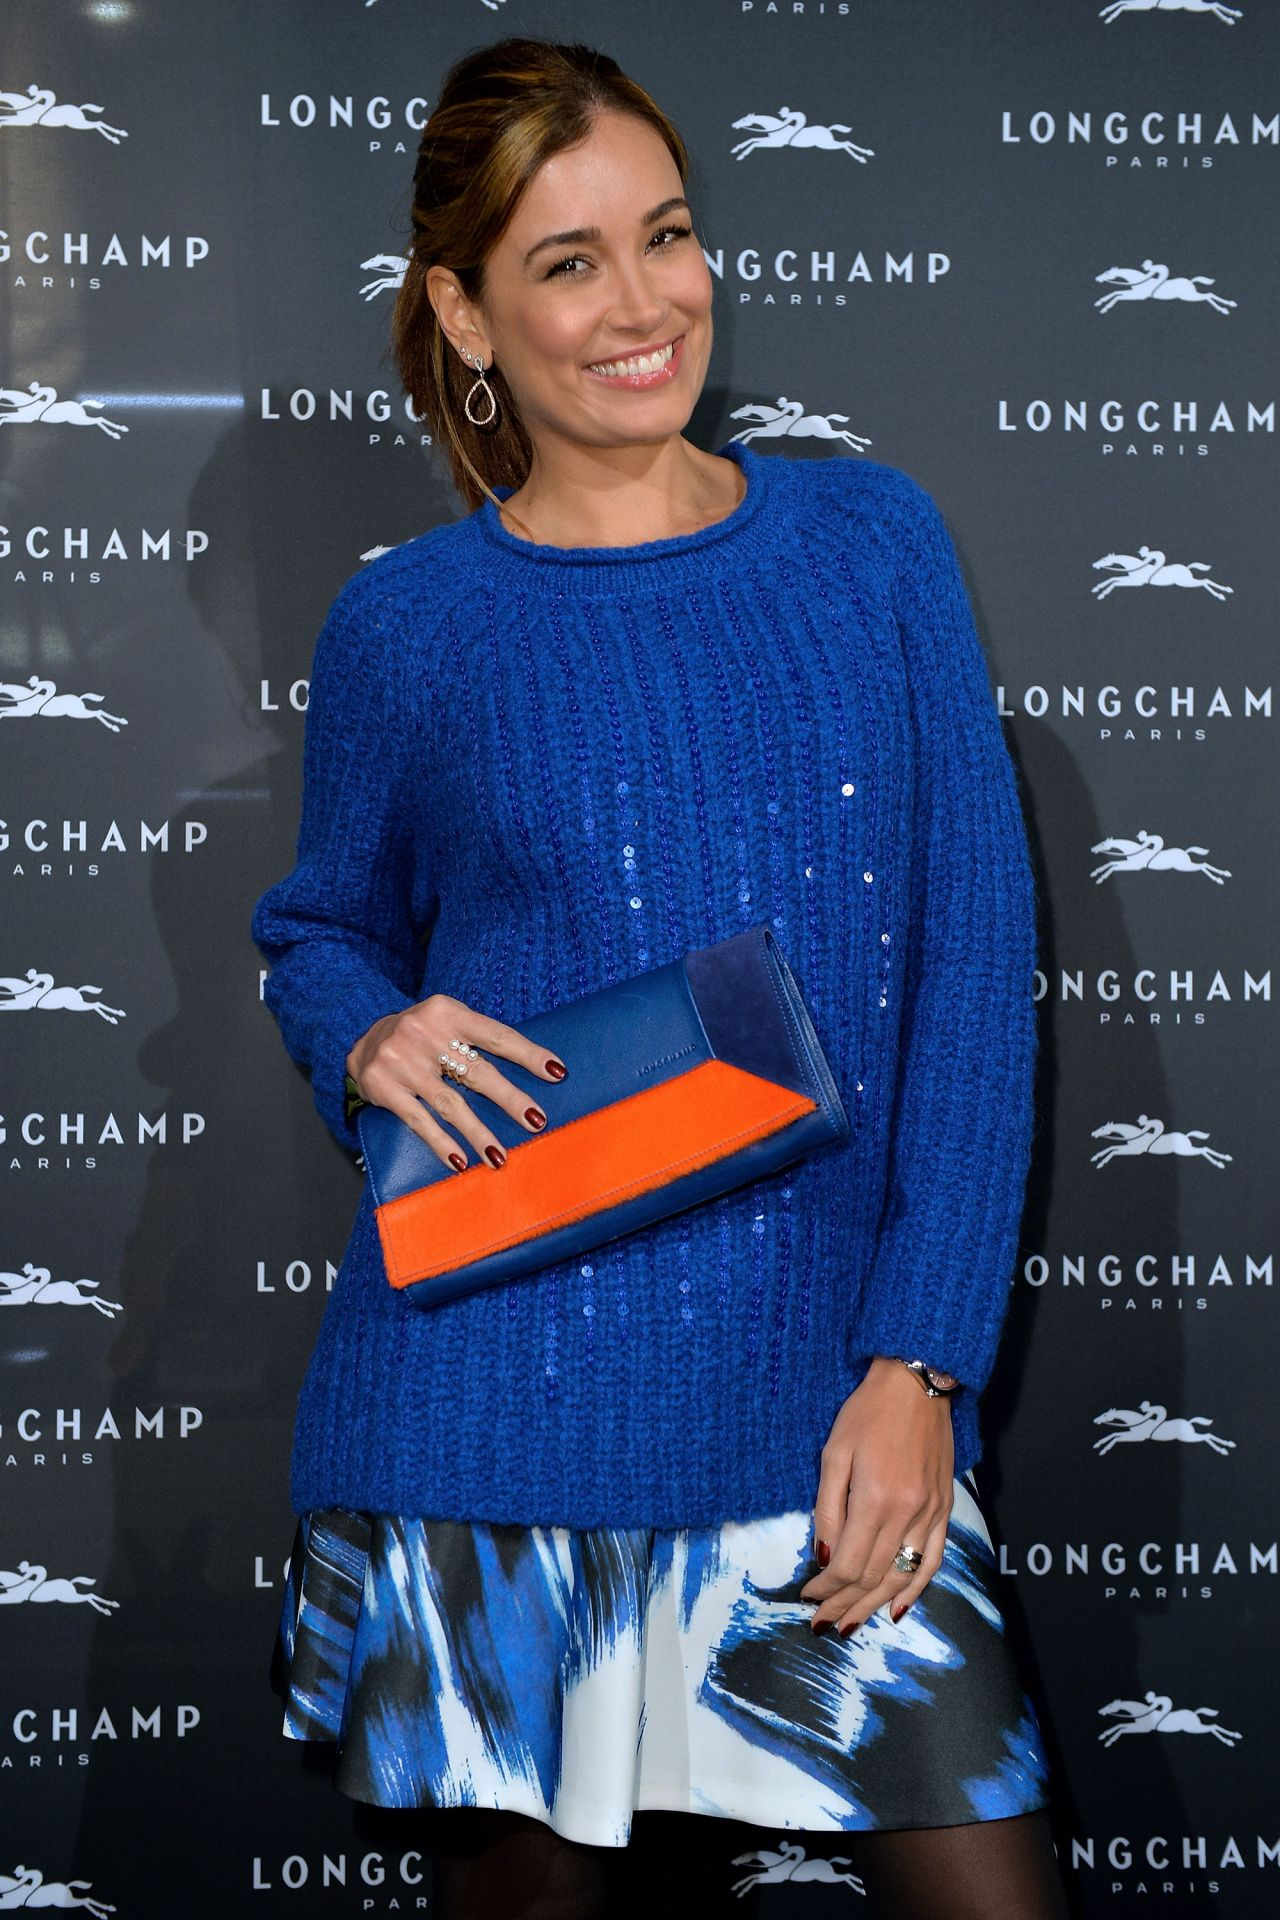 Jana Ina Zarrella Longchamp Store Opening In Cologne